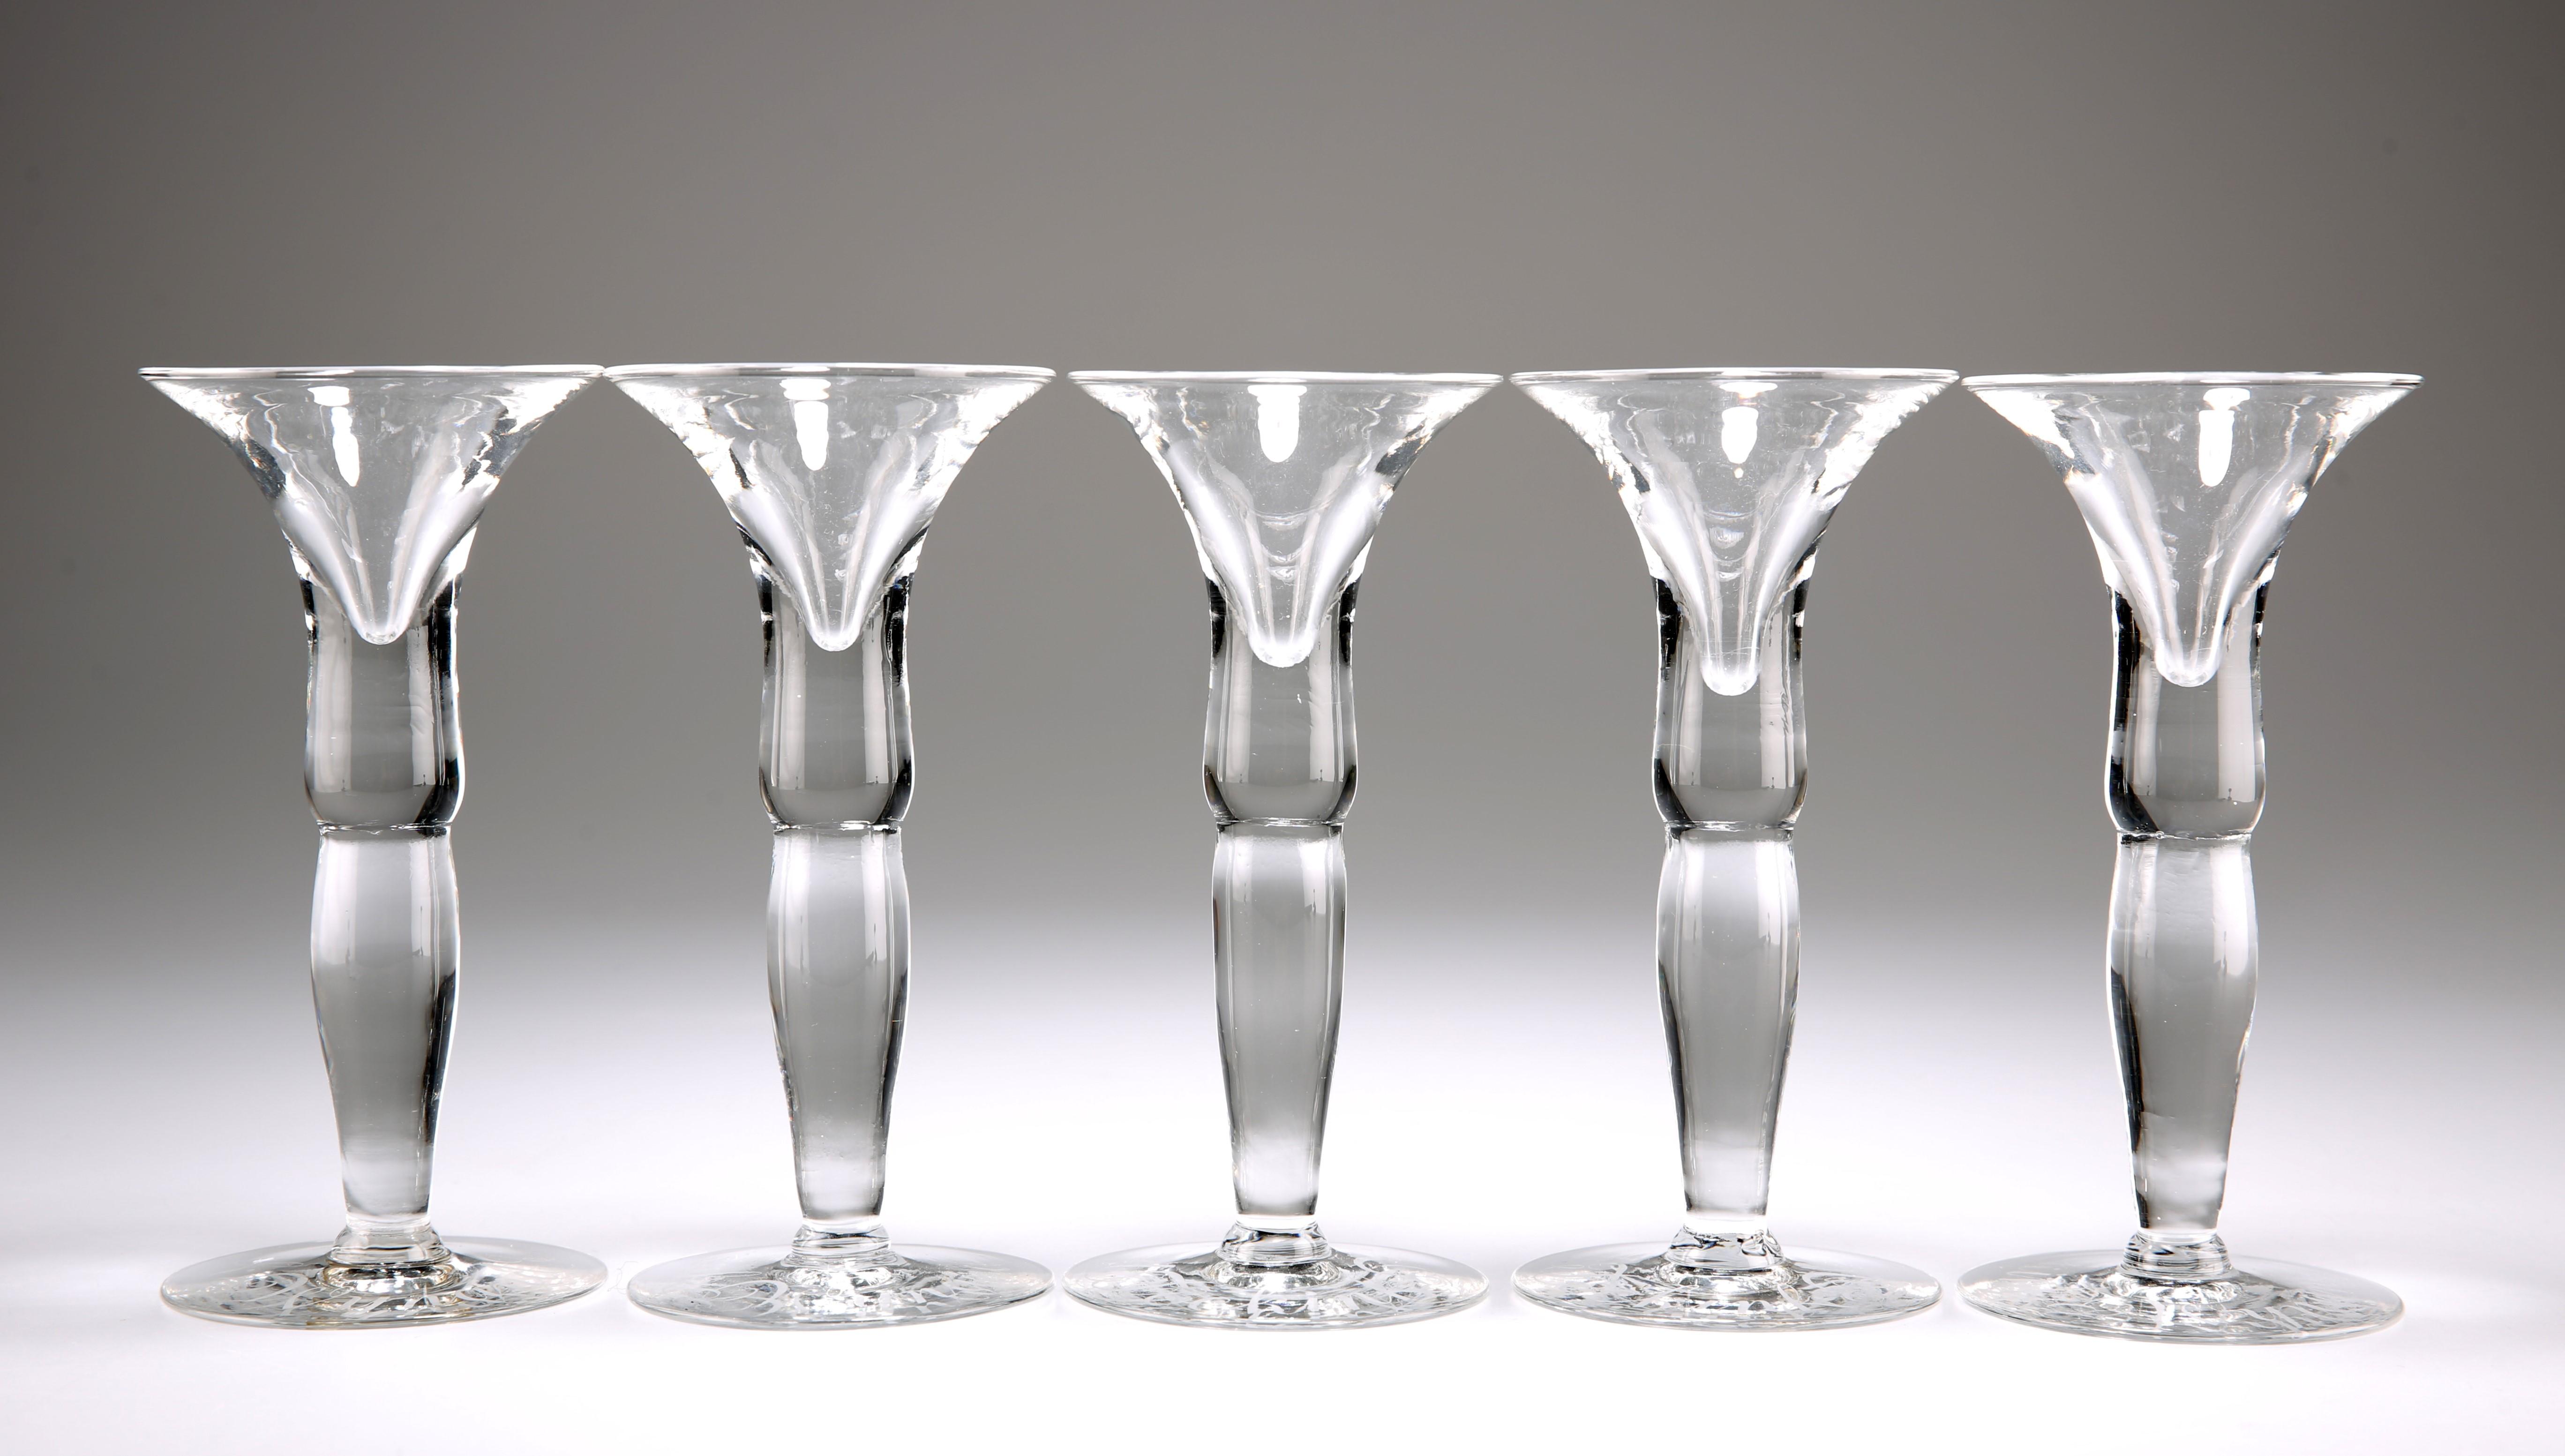 A SET OF FIVE DUTCH WYNAND FOCKINK TASTING GLASSES - Image 2 of 4